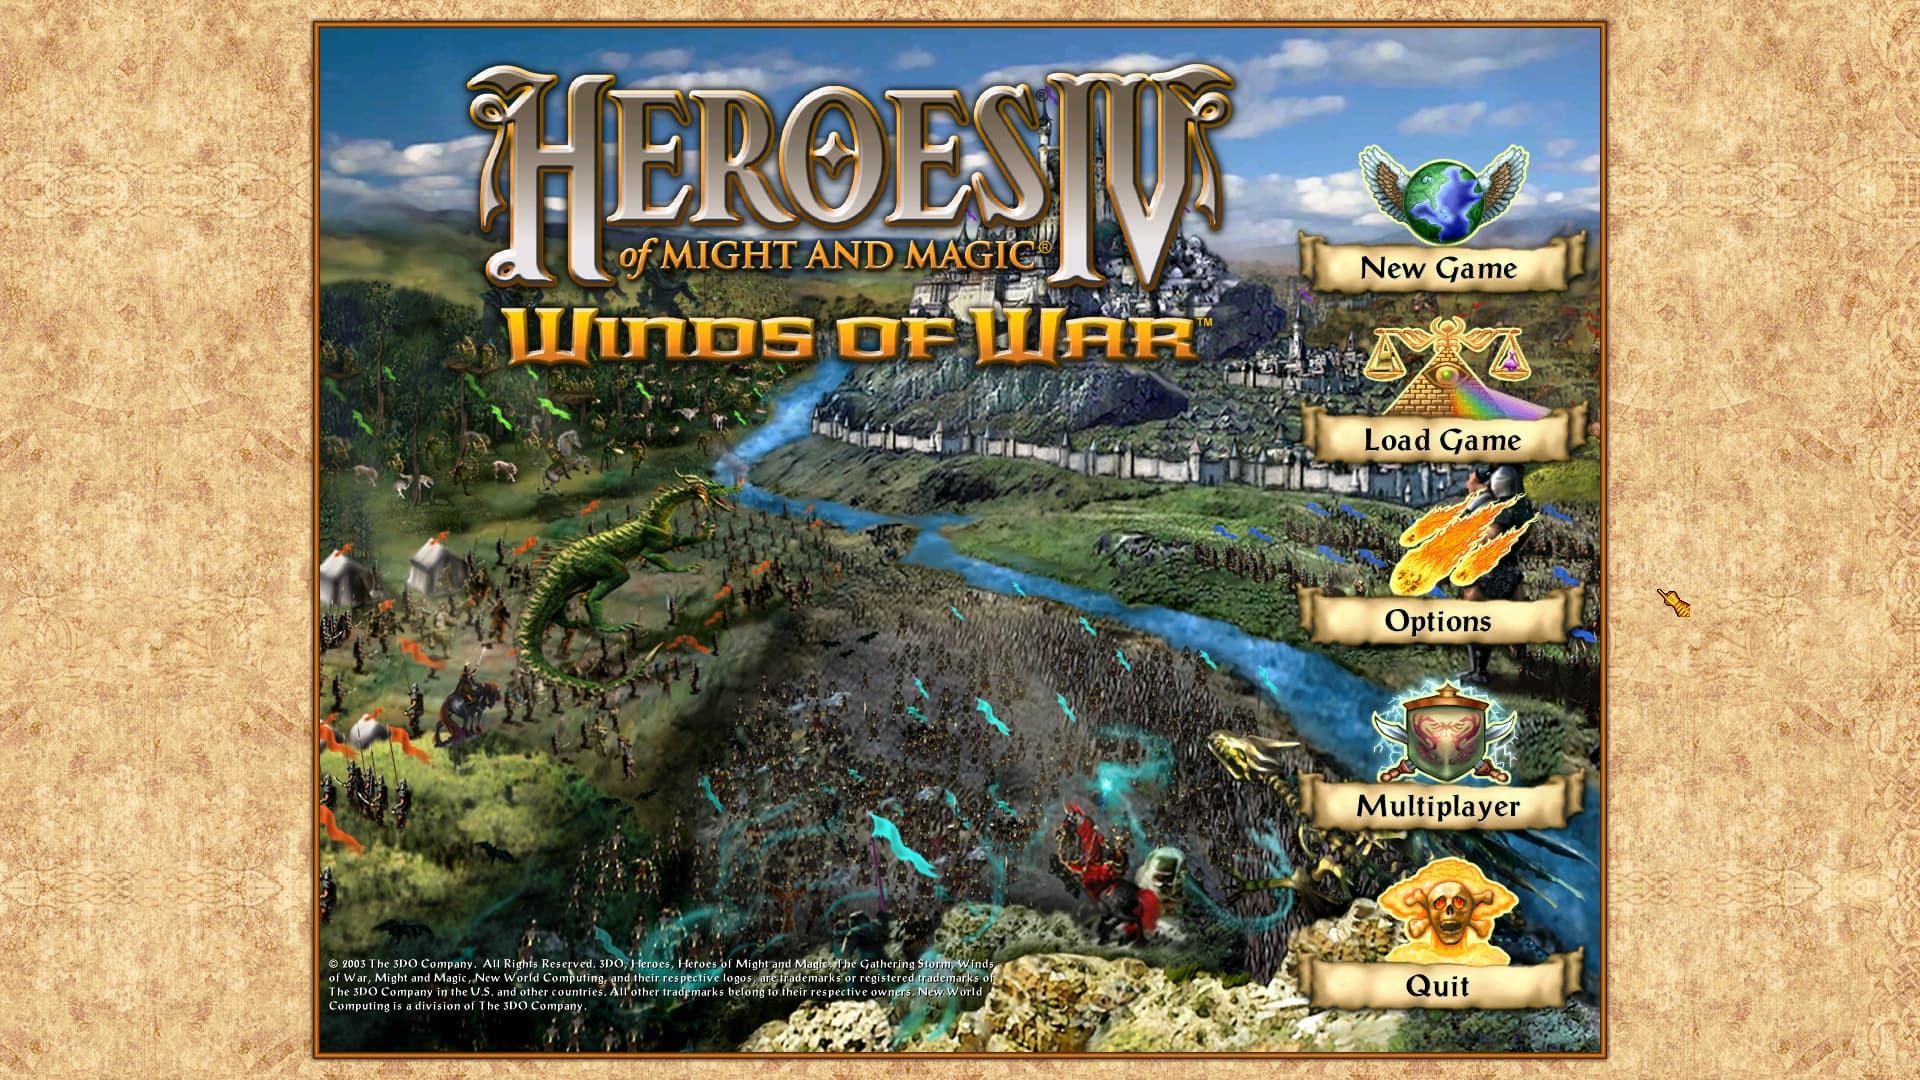 http://heroes.net.pl/uploaded/news-calendar/2020/01main-menu.jpg